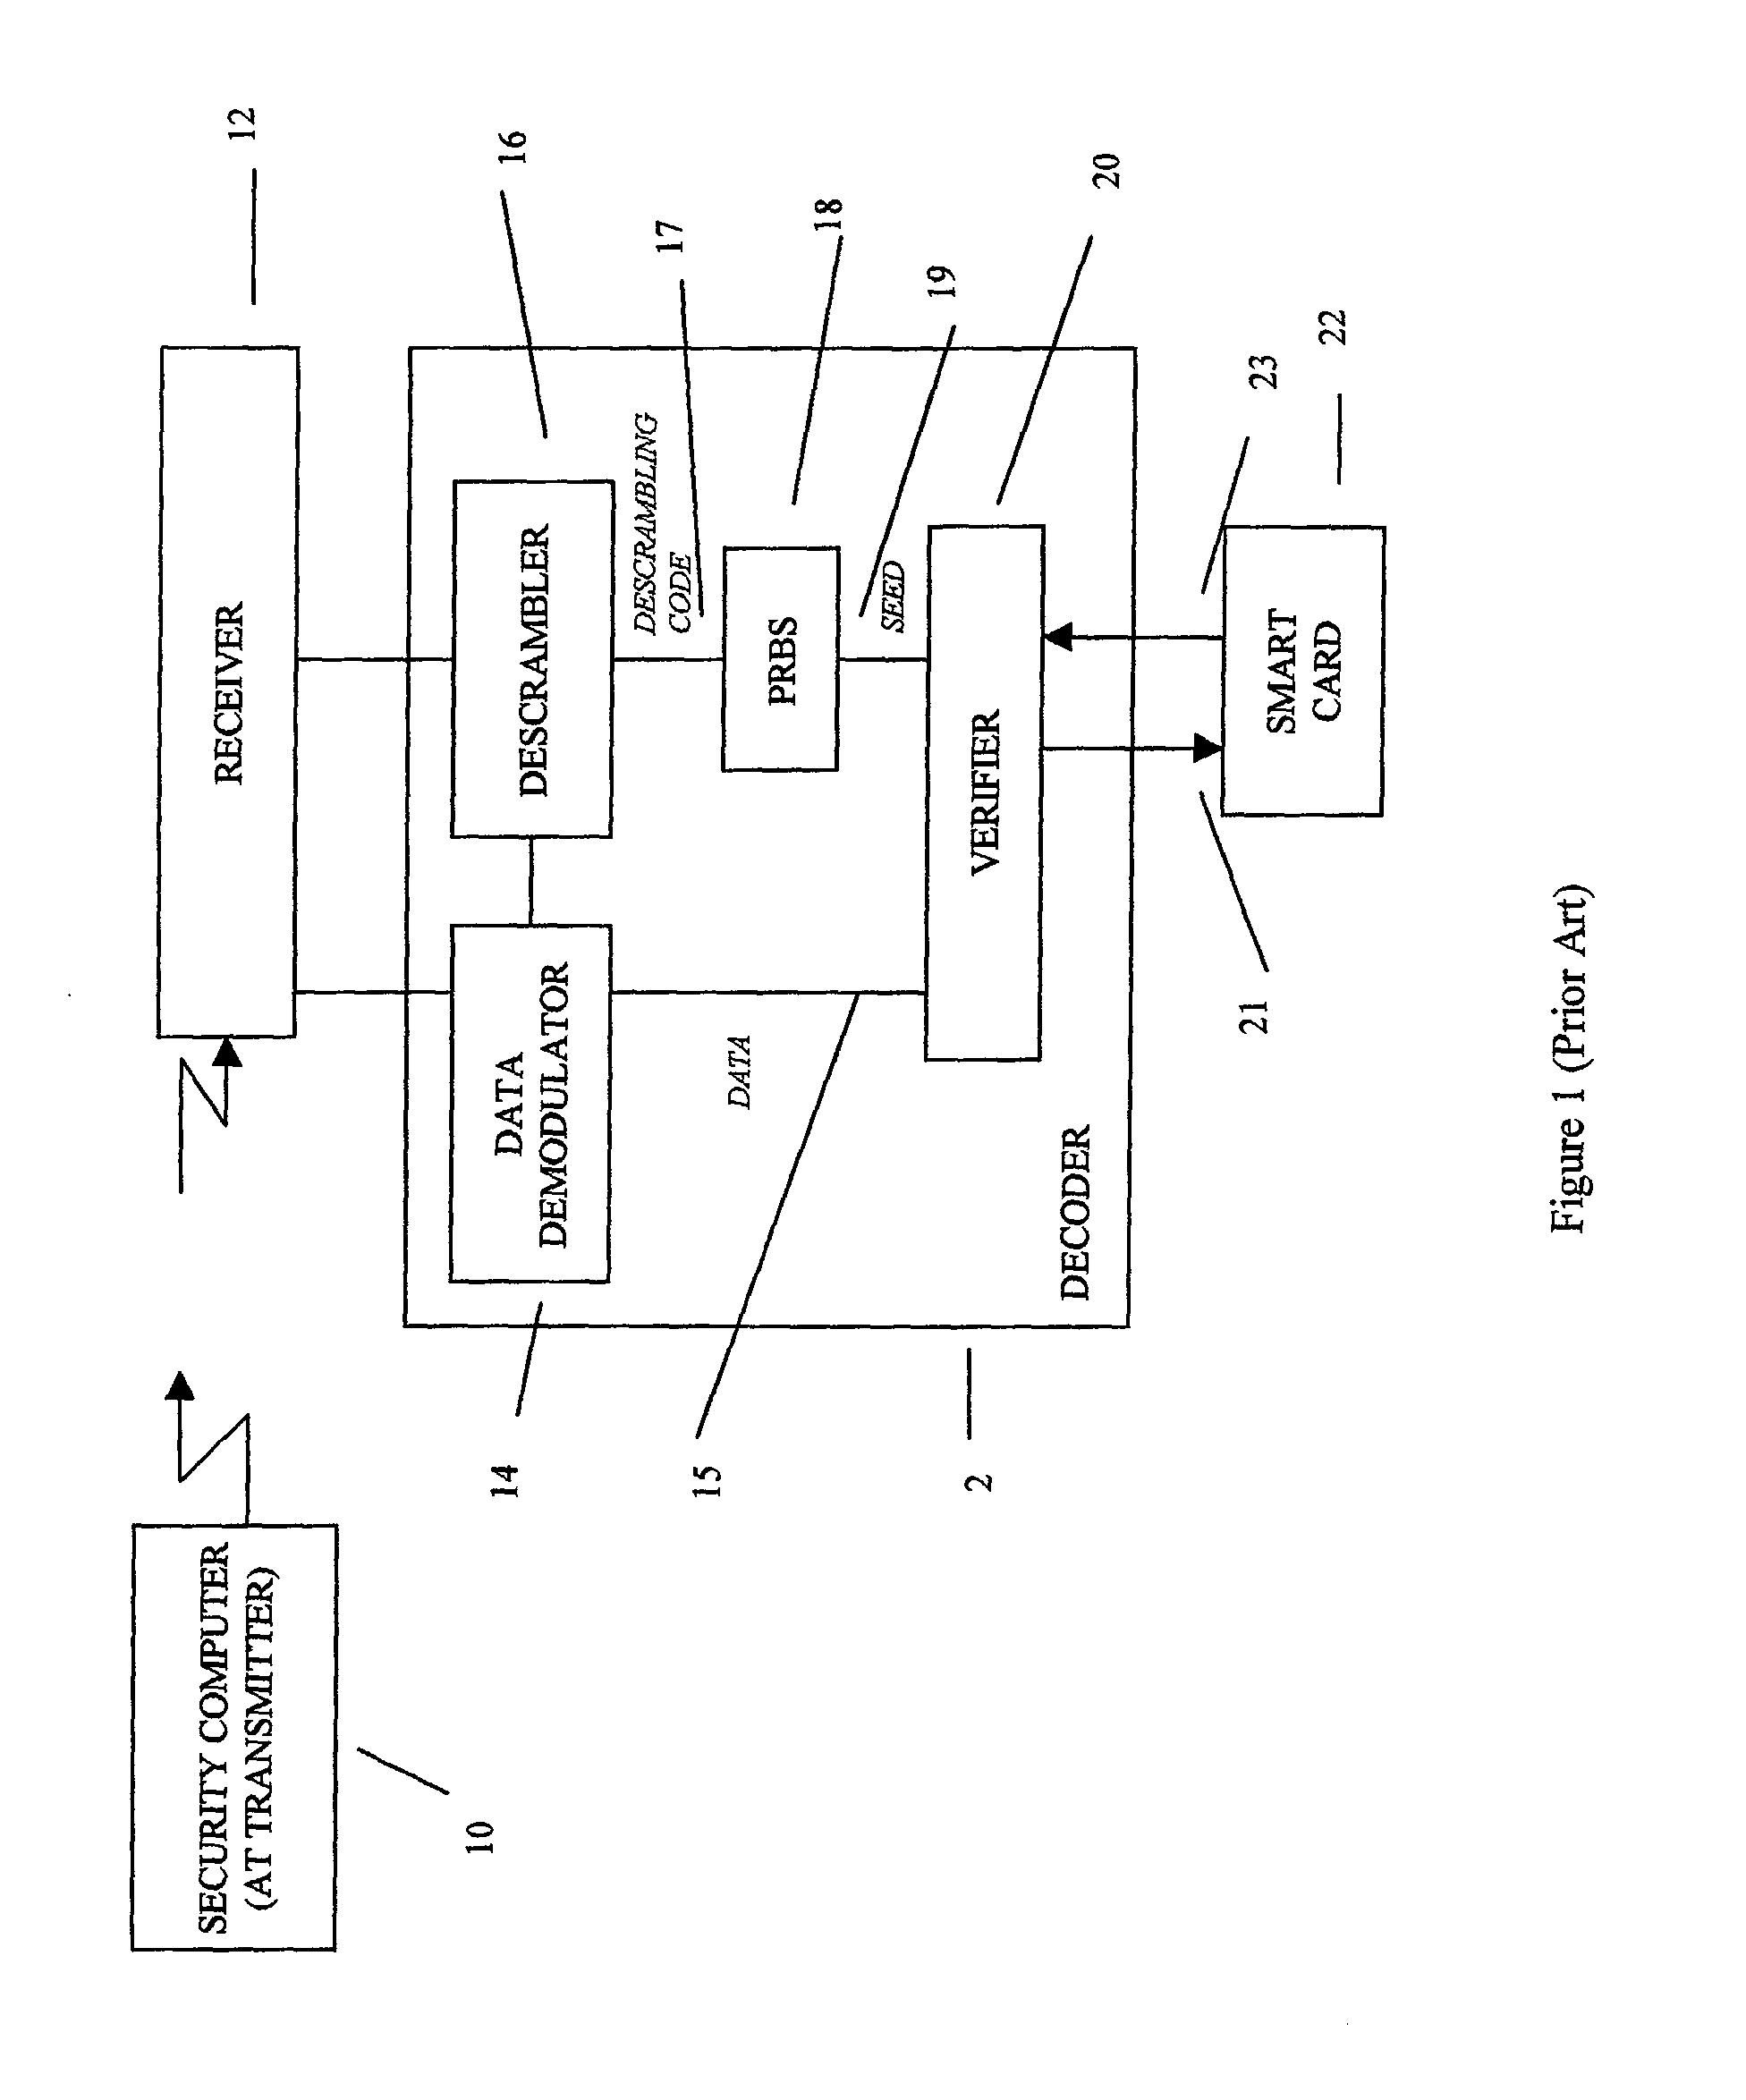 patent ep1467565a1